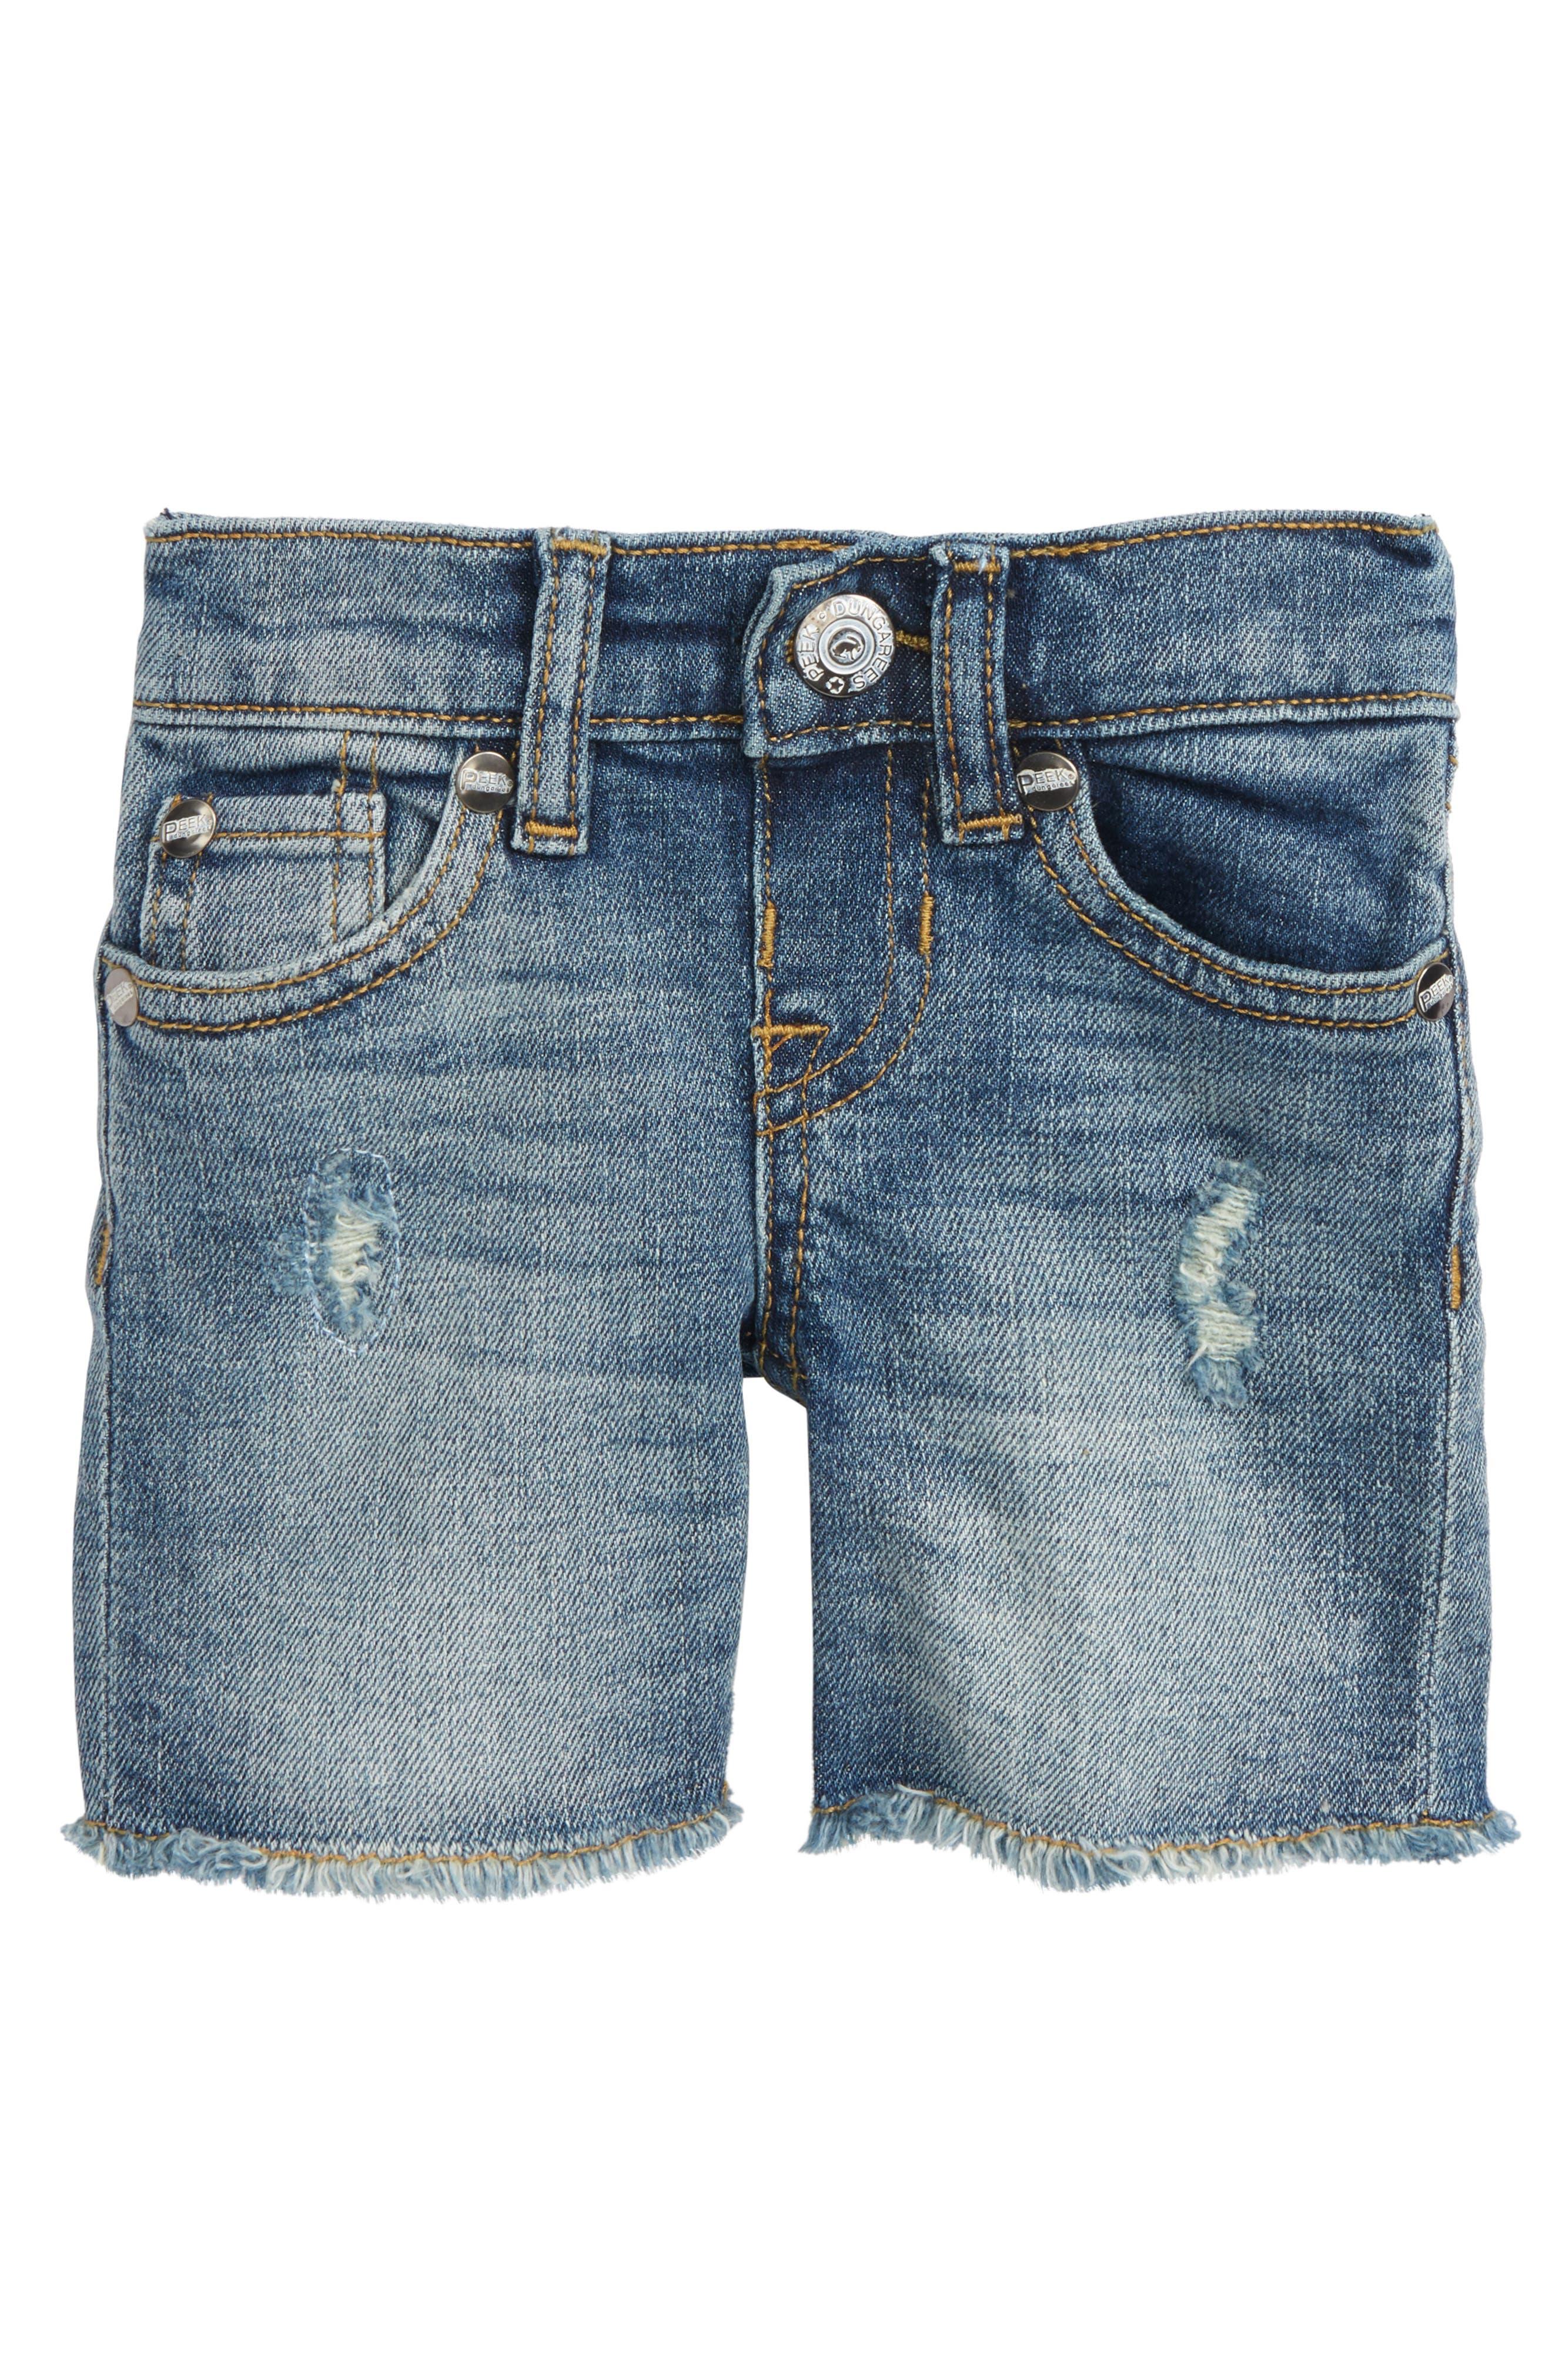 Fairfax Denim Shorts,                         Main,                         color, 400